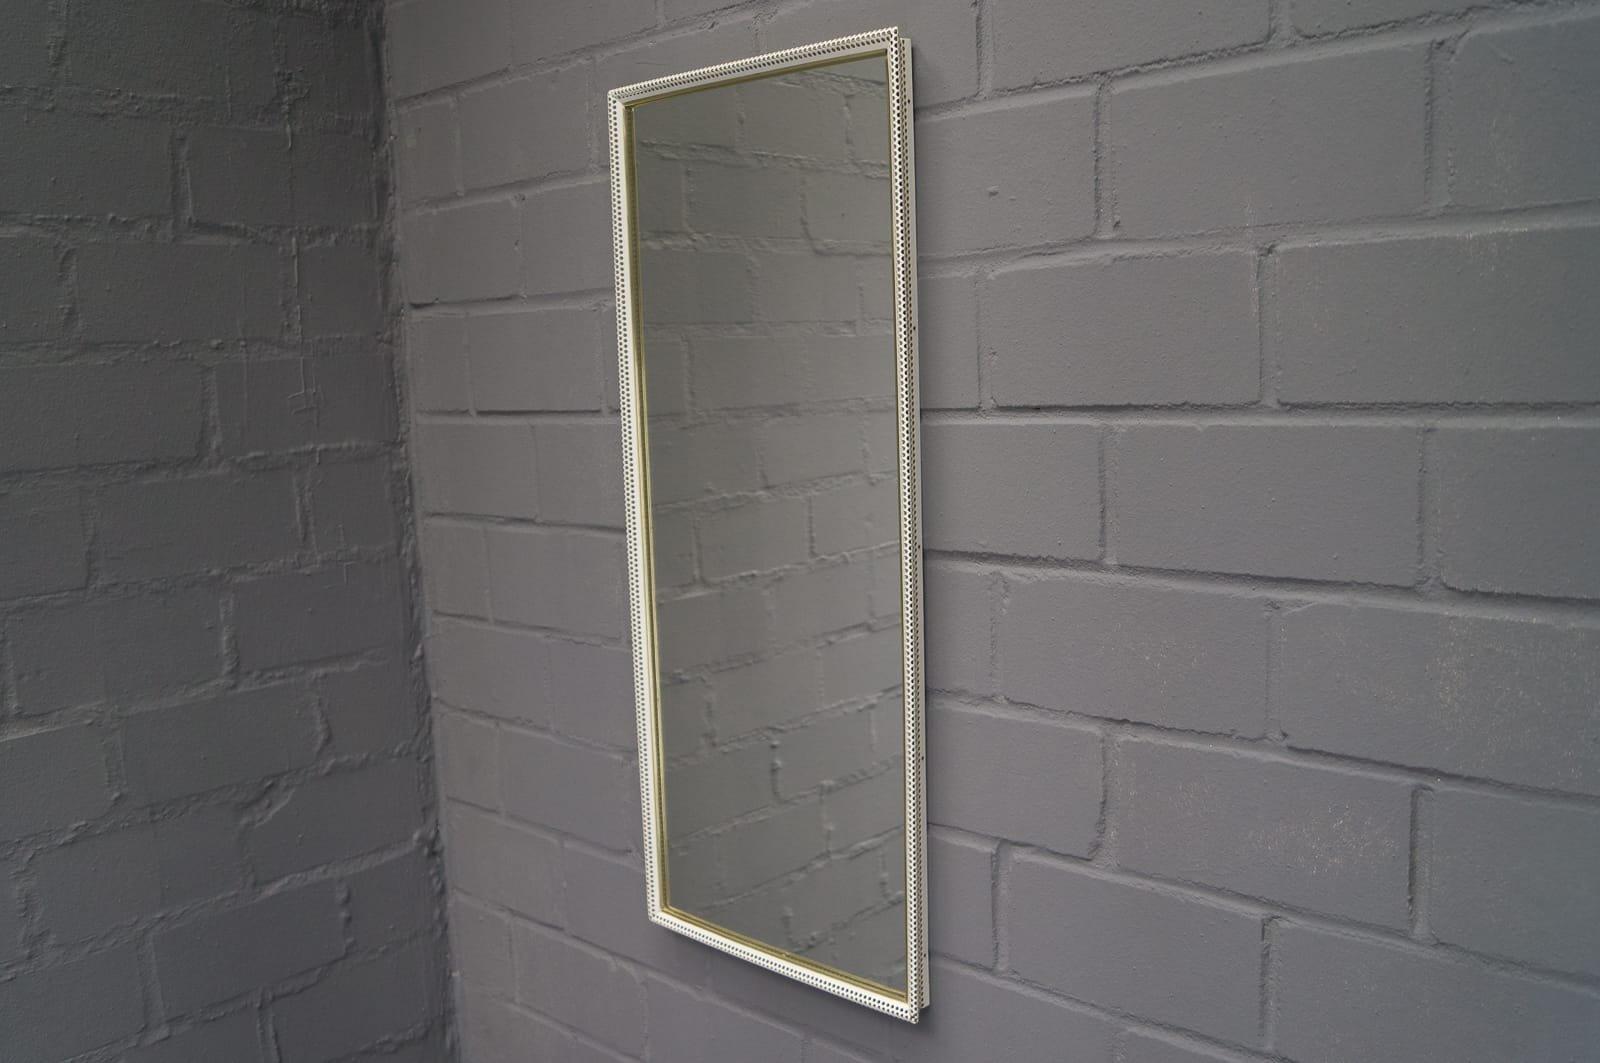 Grand miroir mural rectangulaire en m tal perfor peint de - Grand miroir mural rectangulaire ...